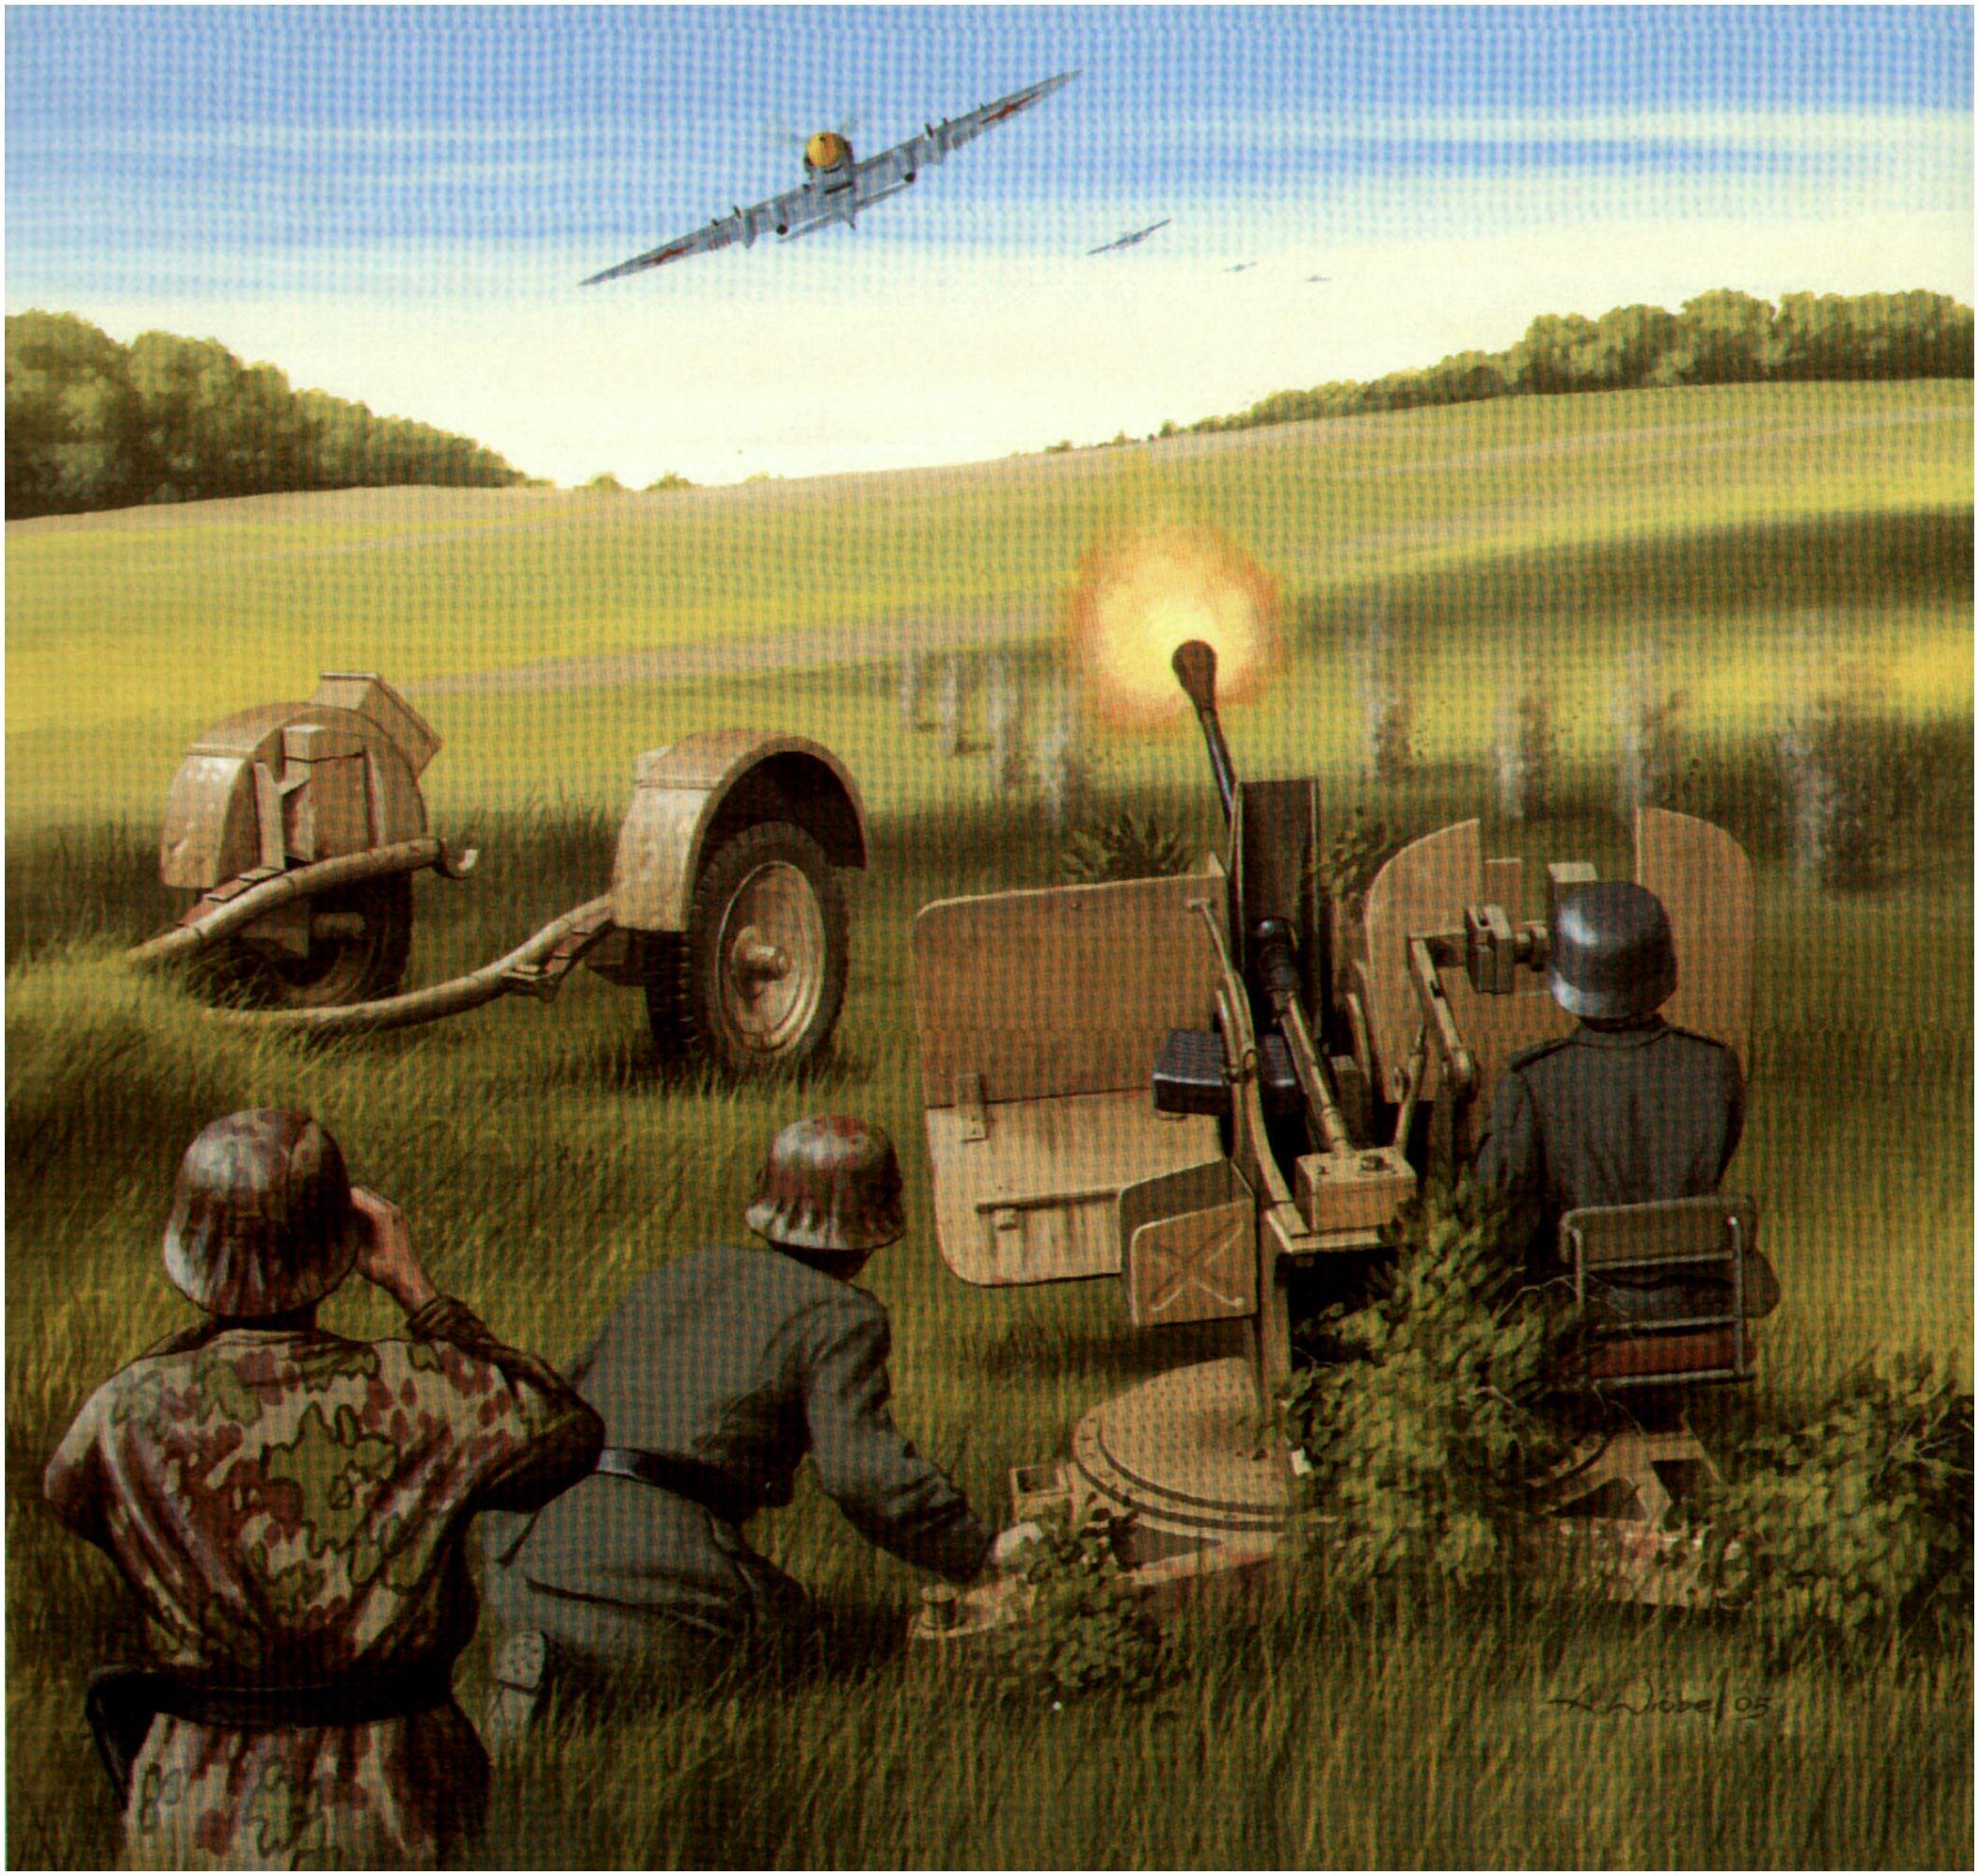 Wróbel Arkadiusz. Зенитное орудие 20mm Flak 38.